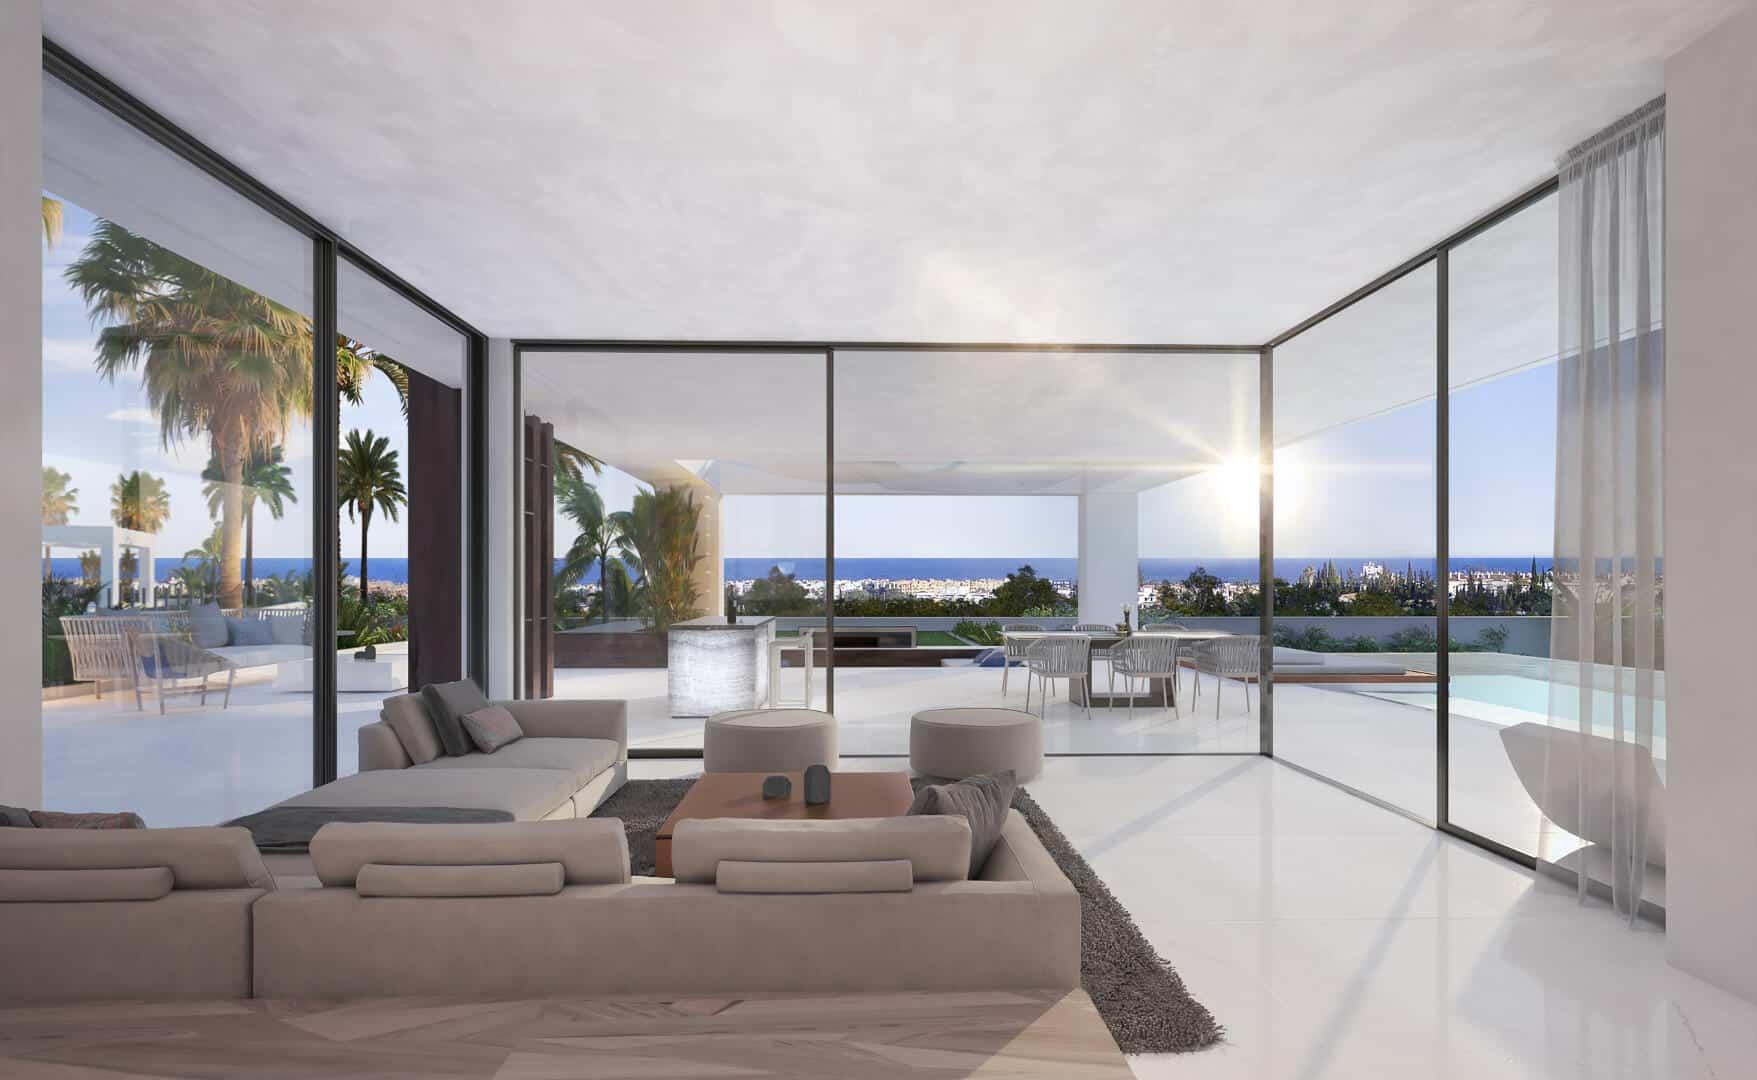 Velvet new development of villas with Sea Views in Cancelada Estepona